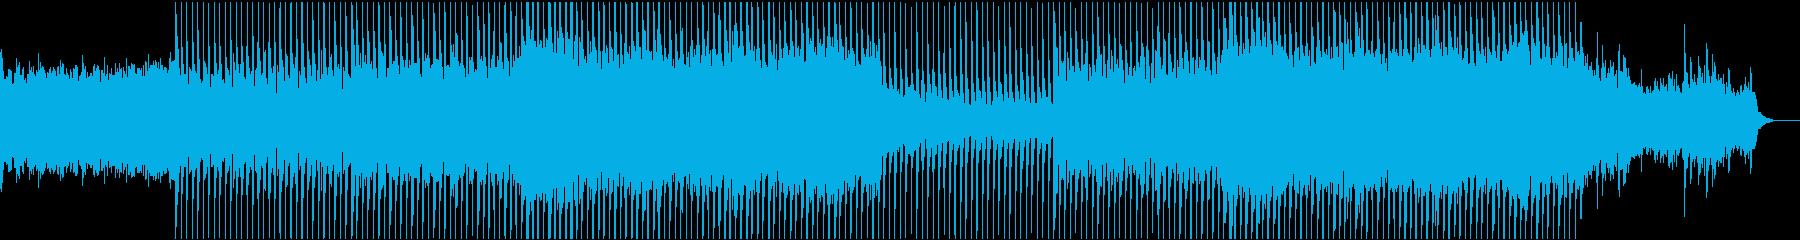 EDMクラブ系ダンスミュージック-28の再生済みの波形